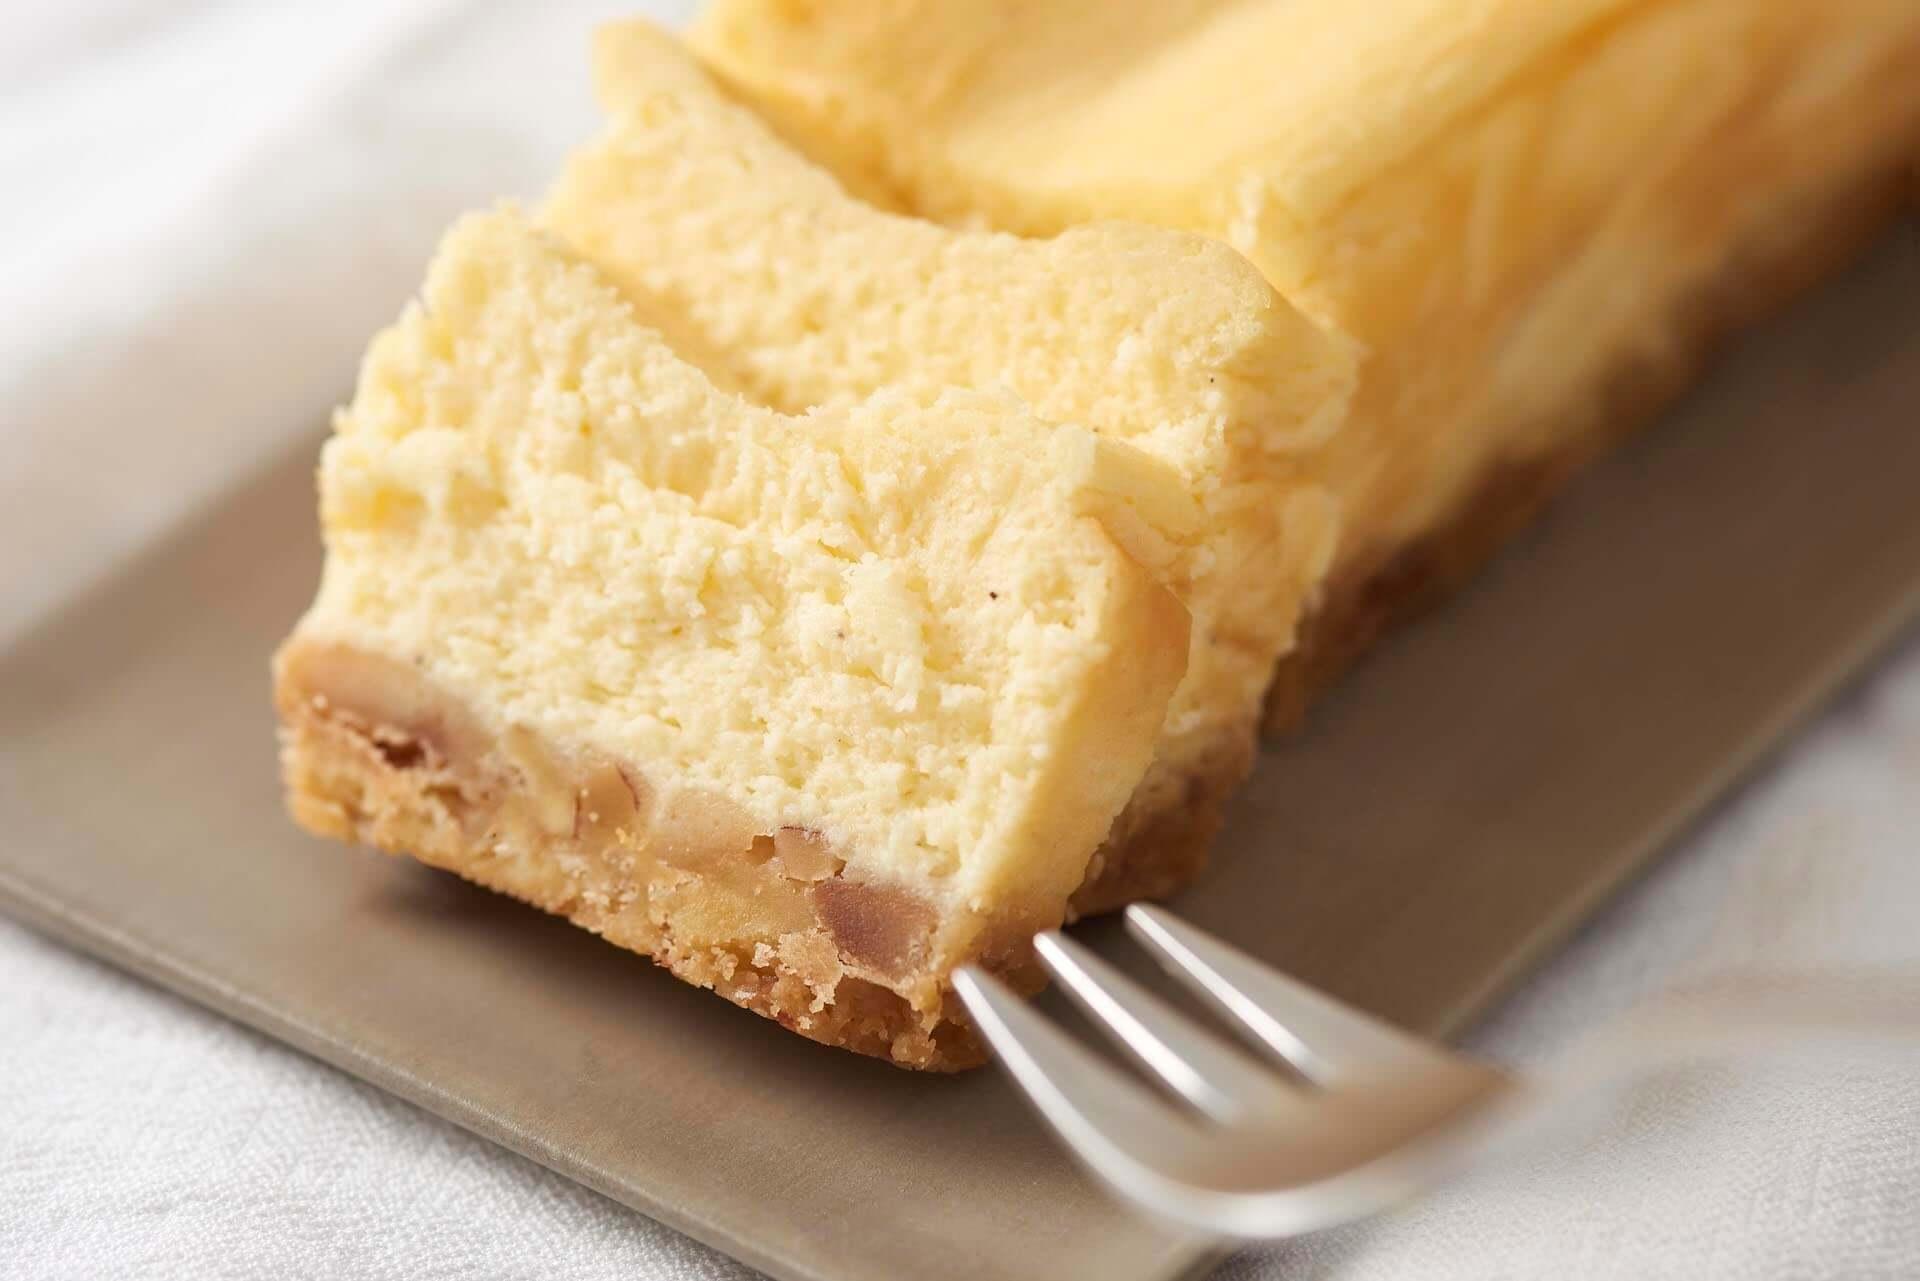 BAKEが濃厚なチーズテリーヌ主軸の新ブランド「THE CHEESE TERRINE by BAKE CHEESE TART」をローンチ!数量限定で予約受付開始 gourmet201201_bake-cheese-tart_4-1920x1281